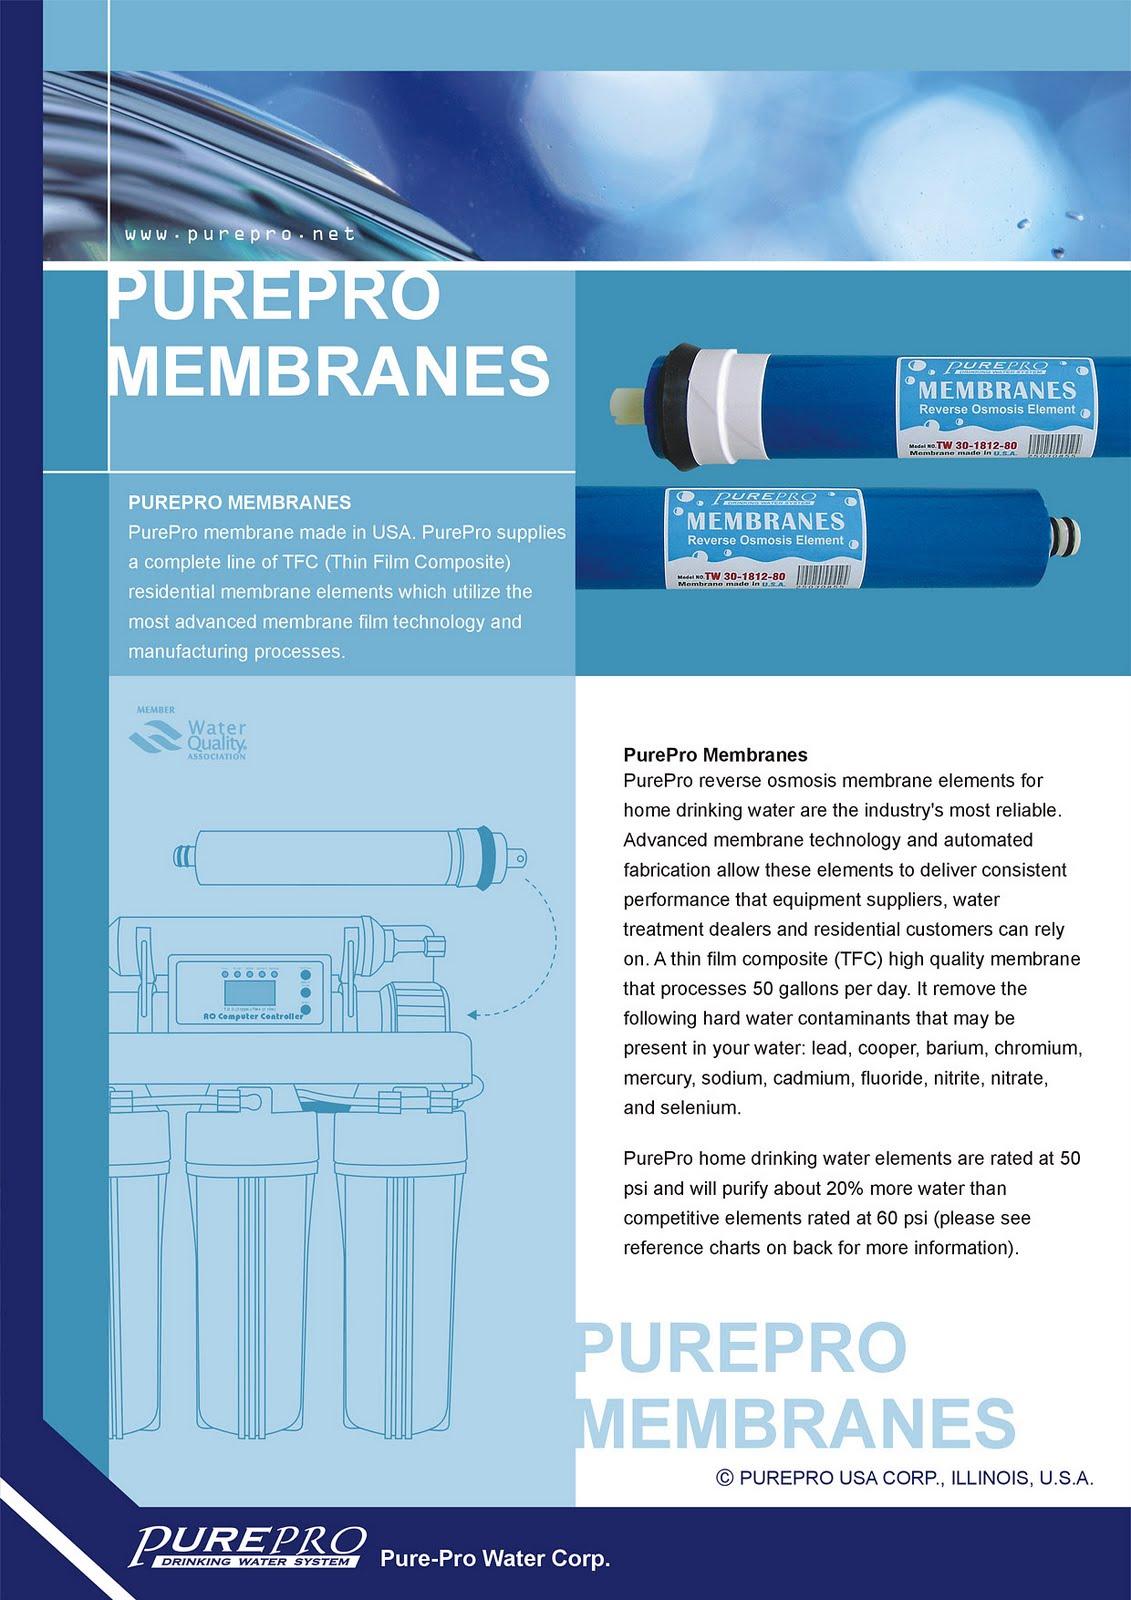 PurePro® USA Reverse Osmosis Membranes